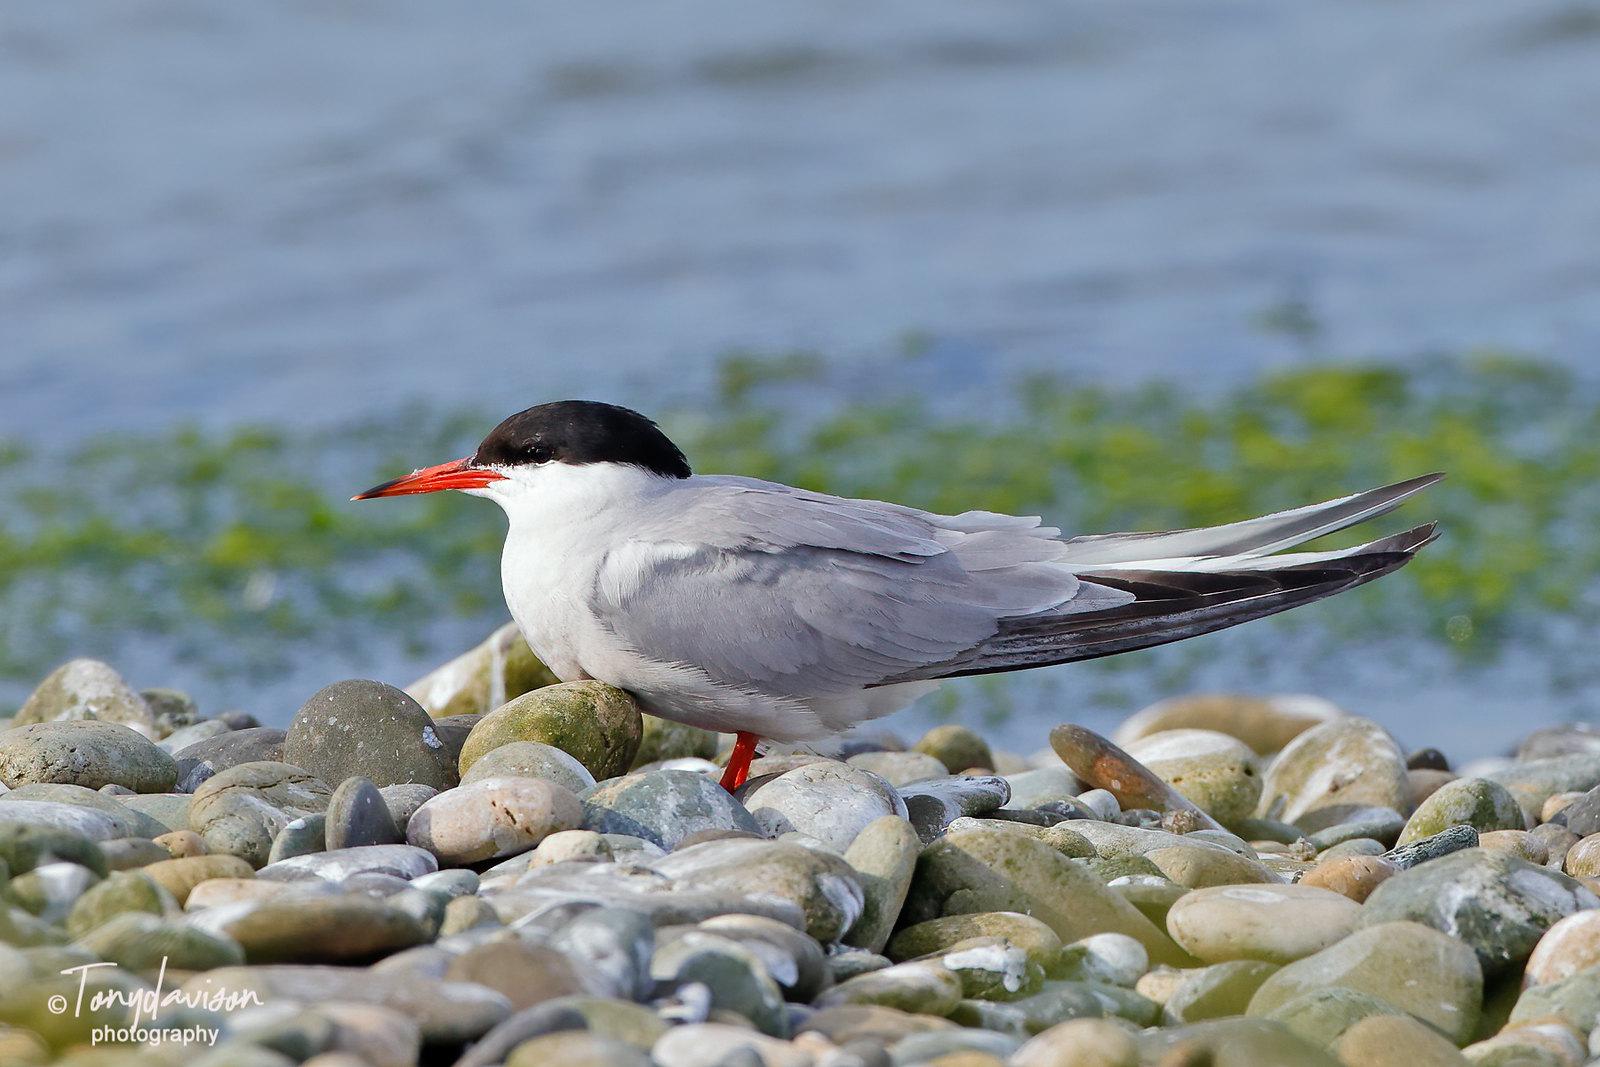 Common Tern - adult